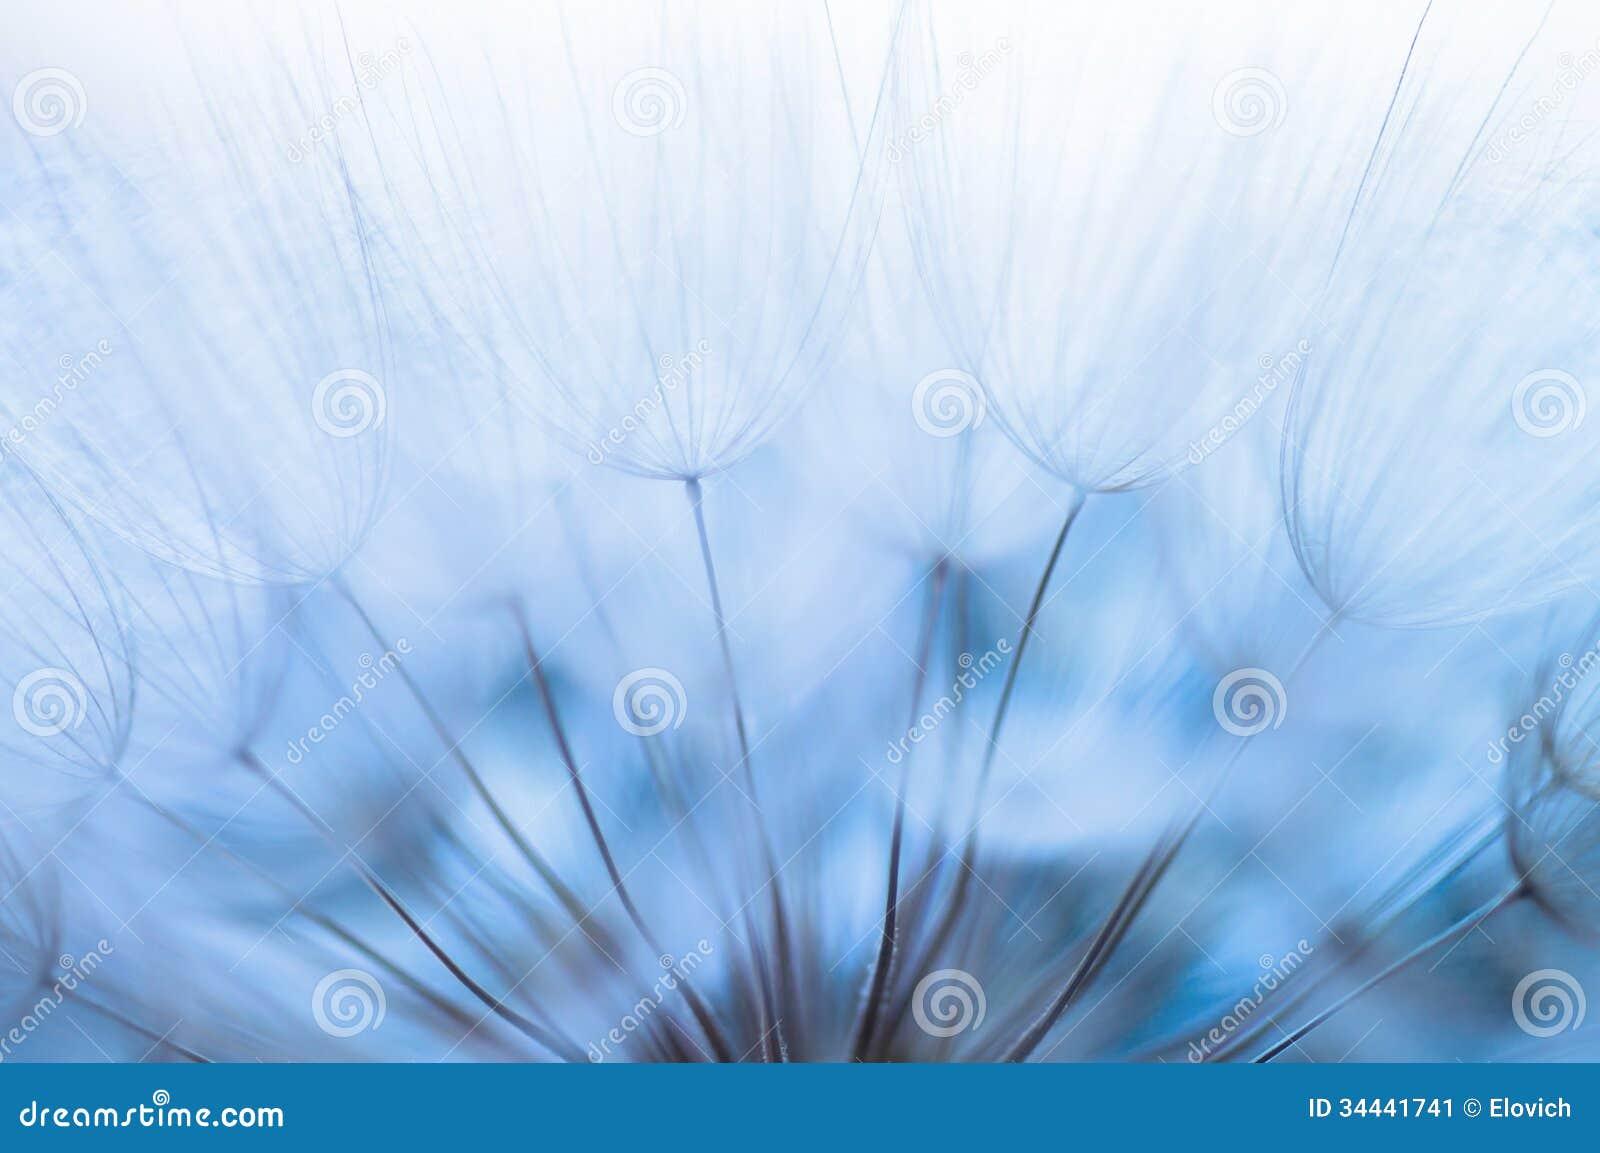 Seeds Clipart